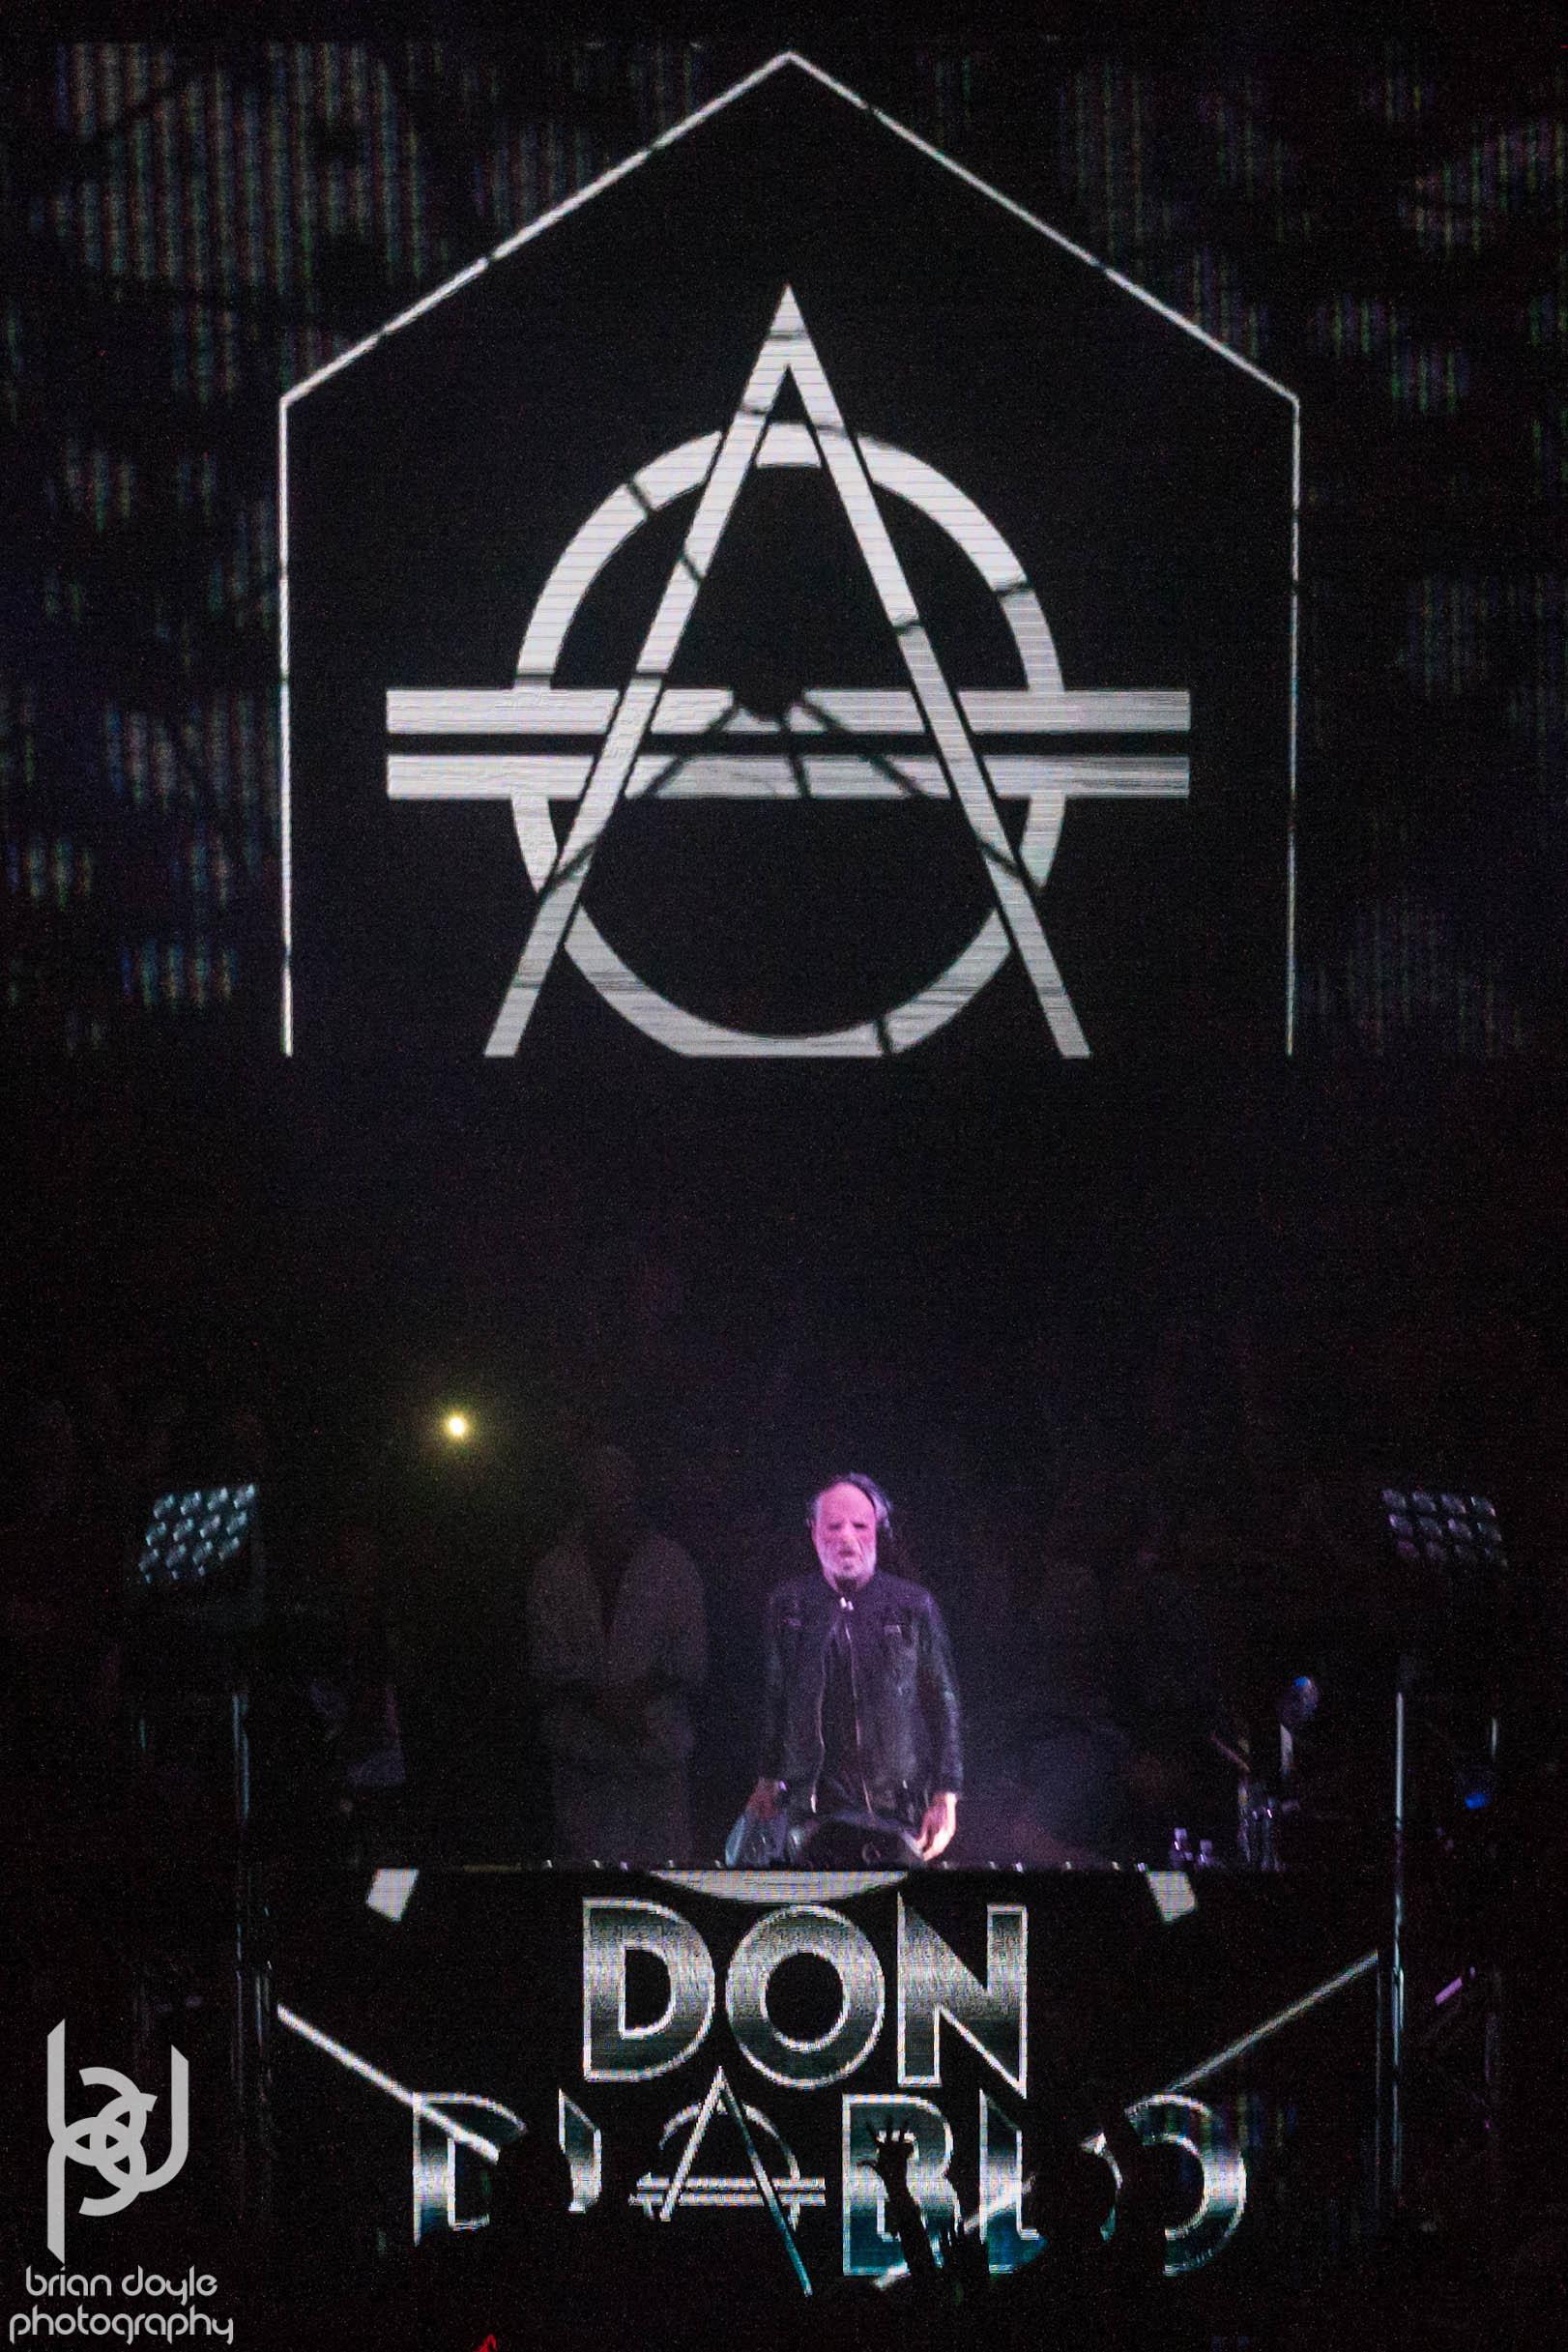 Don Diablo at Avalon bdp 20140908-35.jpg